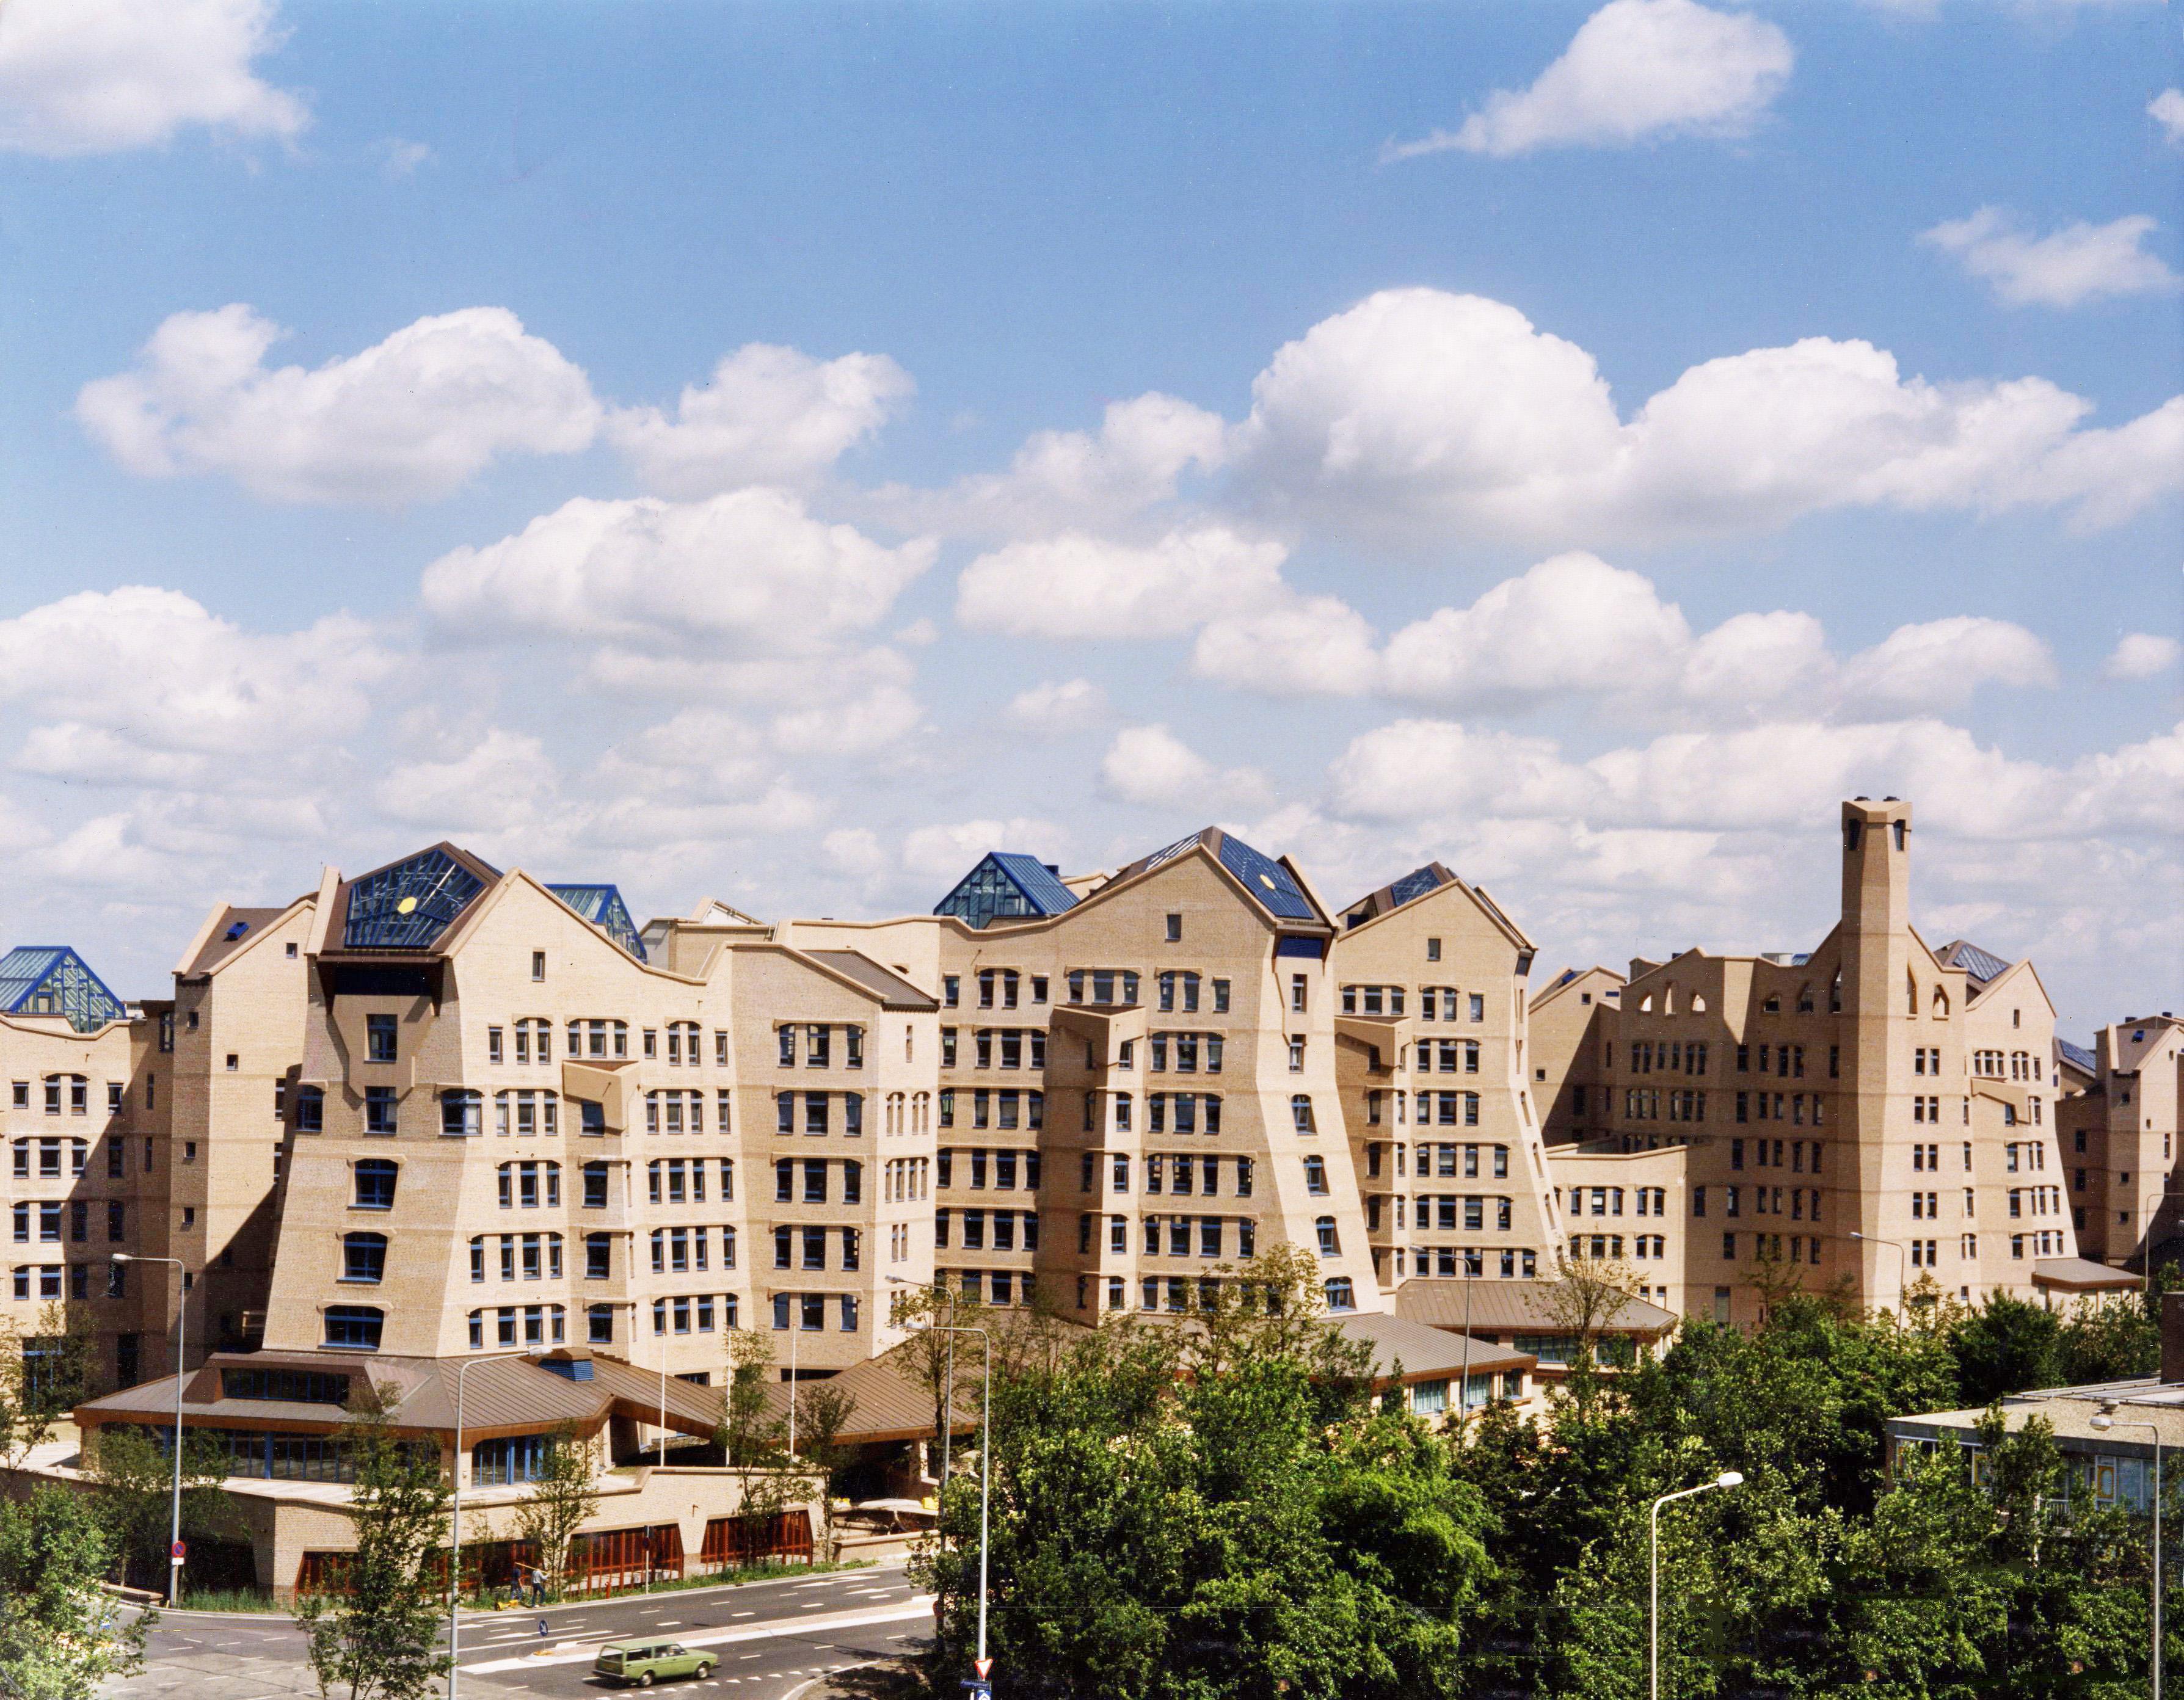 File:ING Headoffice Amsterdam (2).jpg - Wikimedia Commons: commons.wikimedia.org/wiki/file:ing_headoffice_amsterdam_(2).jpg